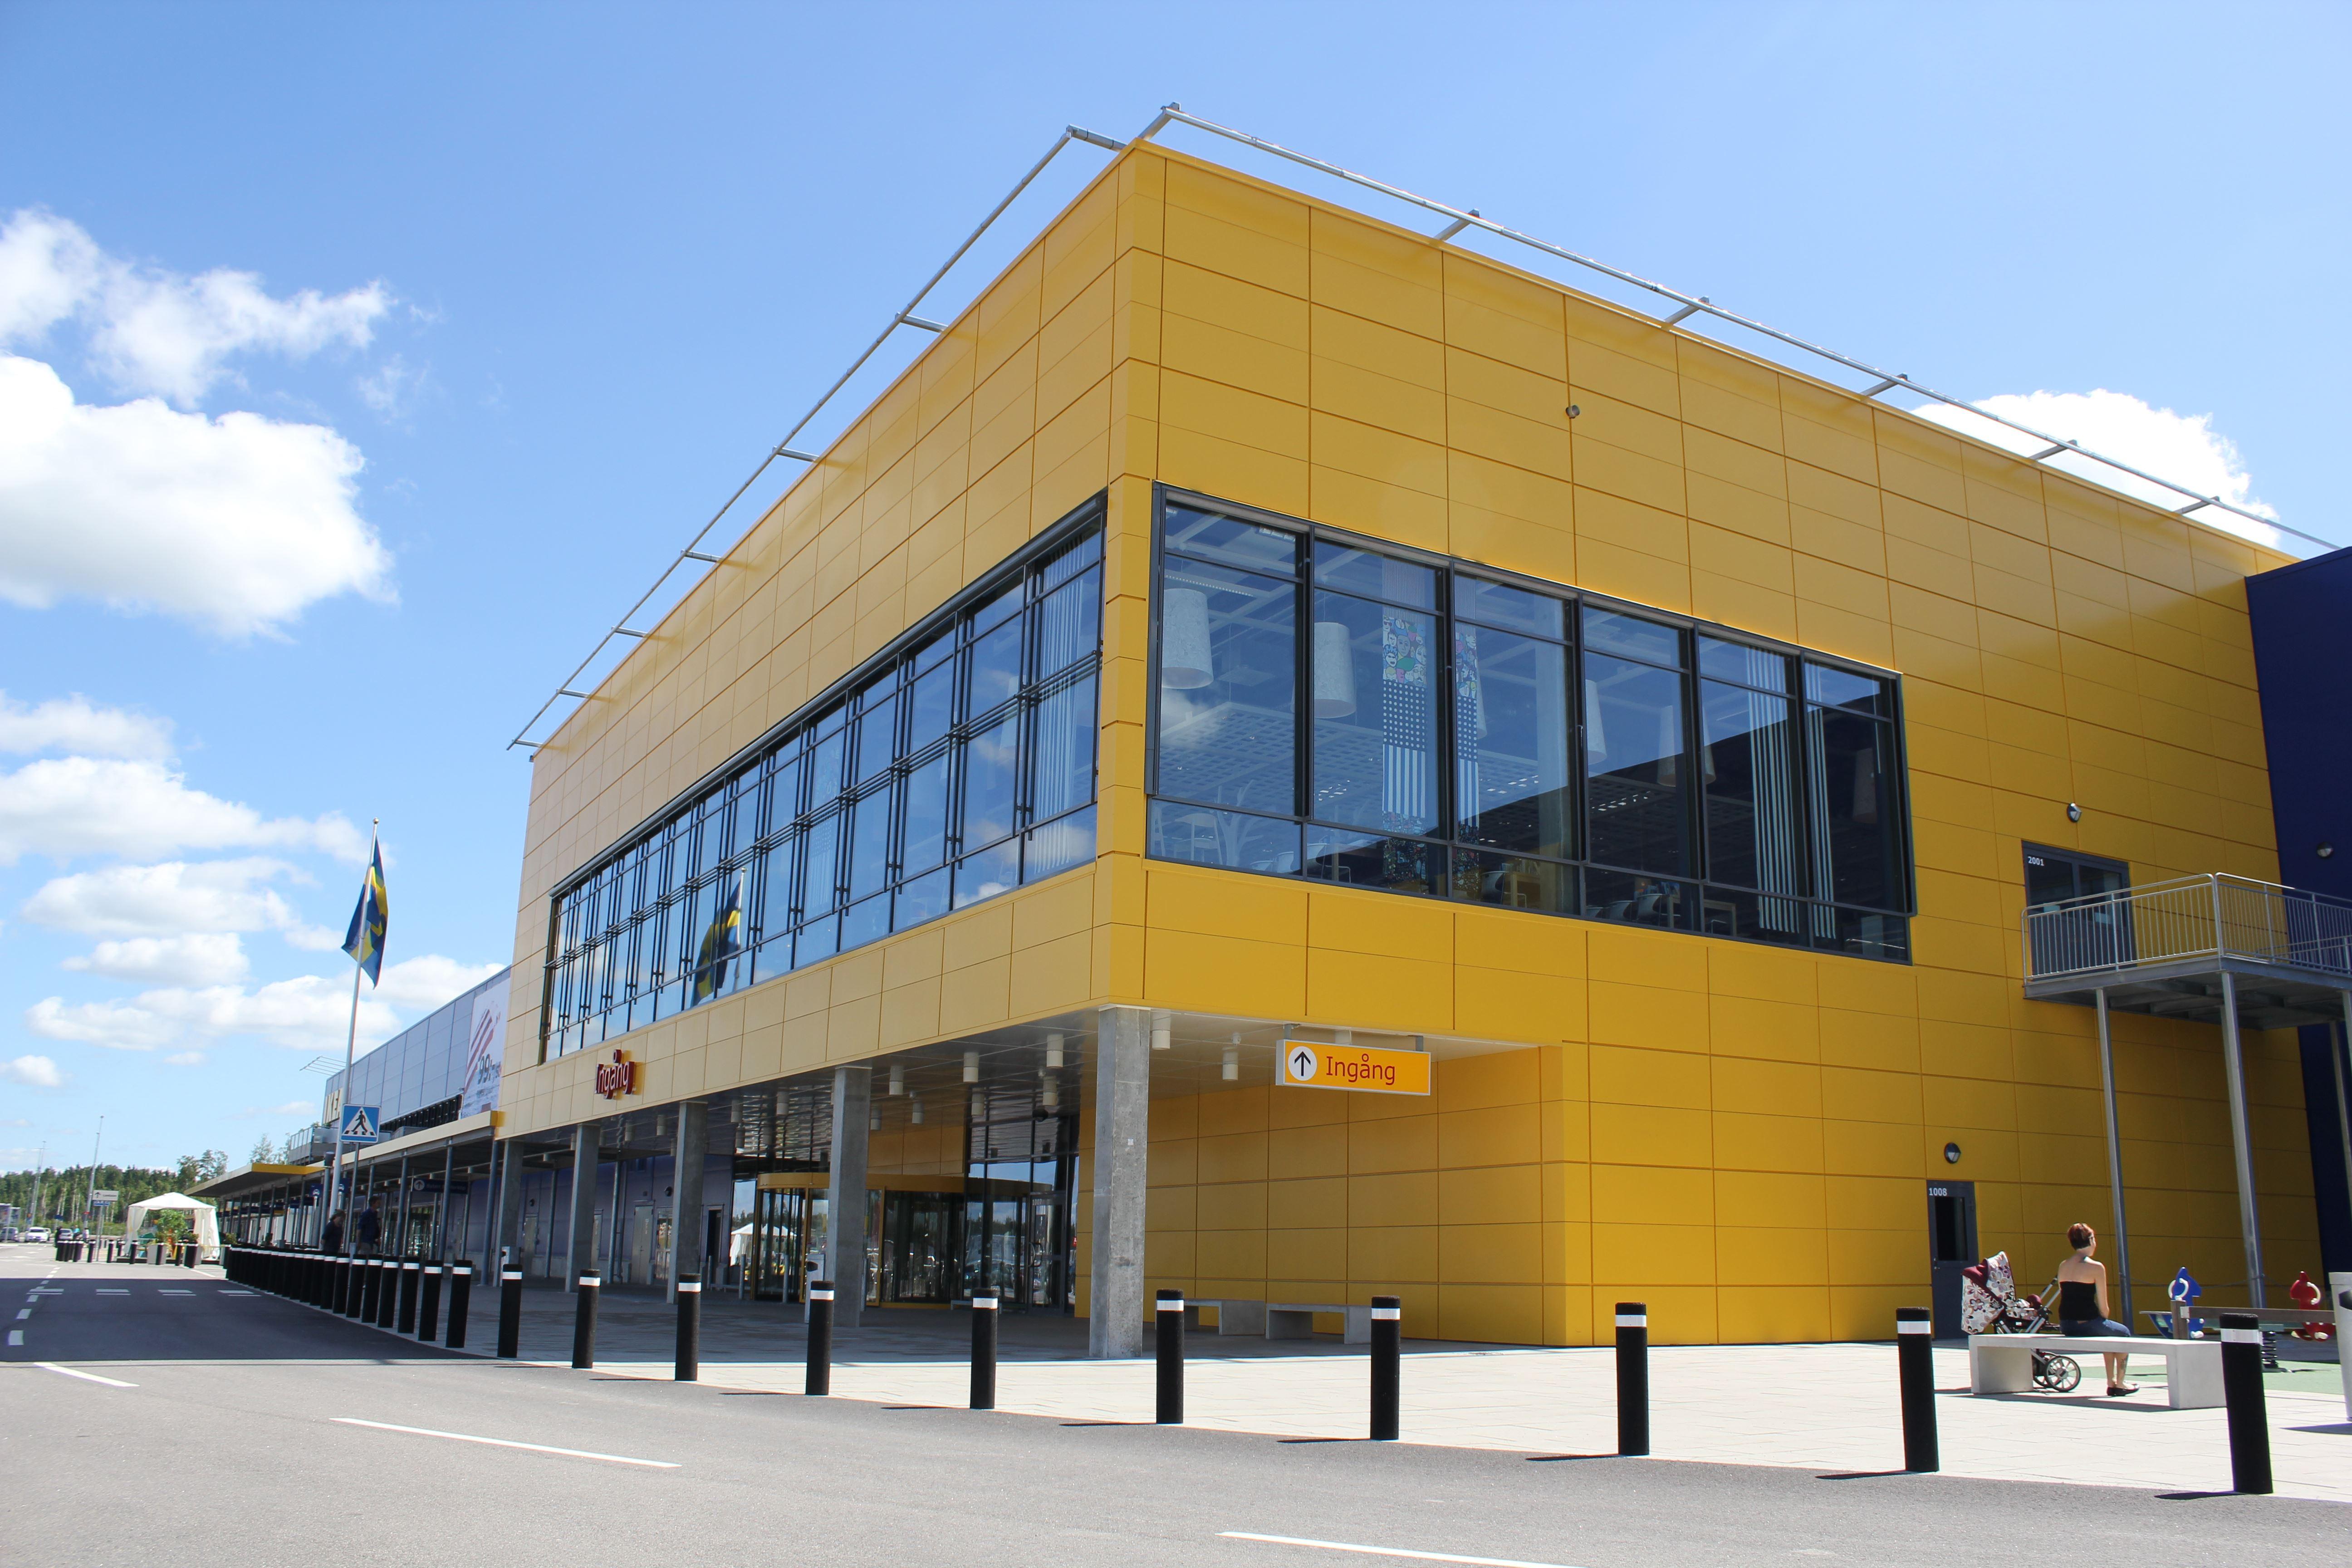 IKEA-restaurangen - IKEA Varuhus